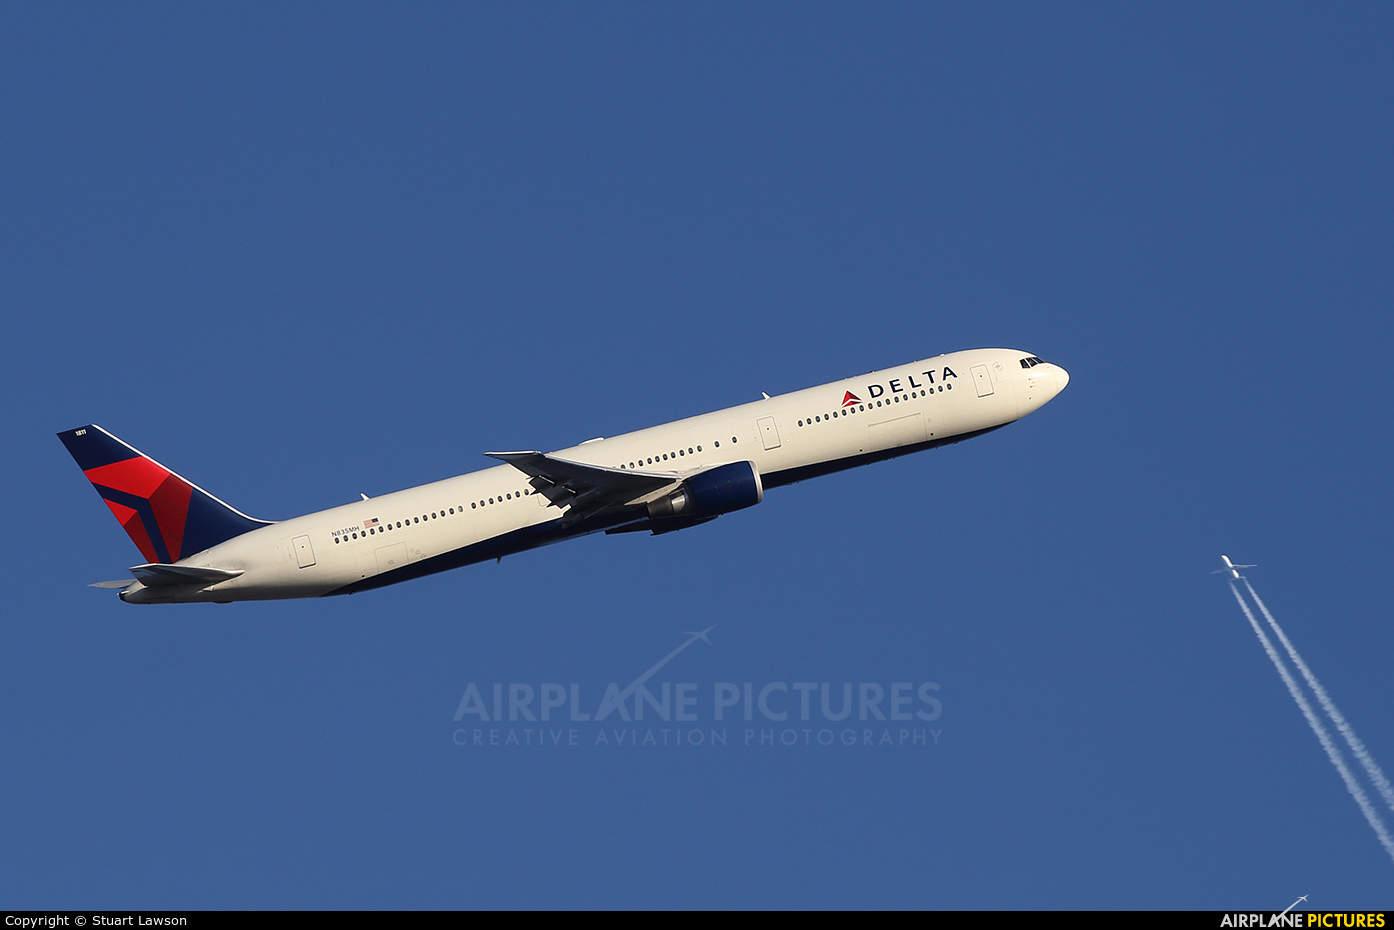 Delta Air Lines confirms new Premium Economy product